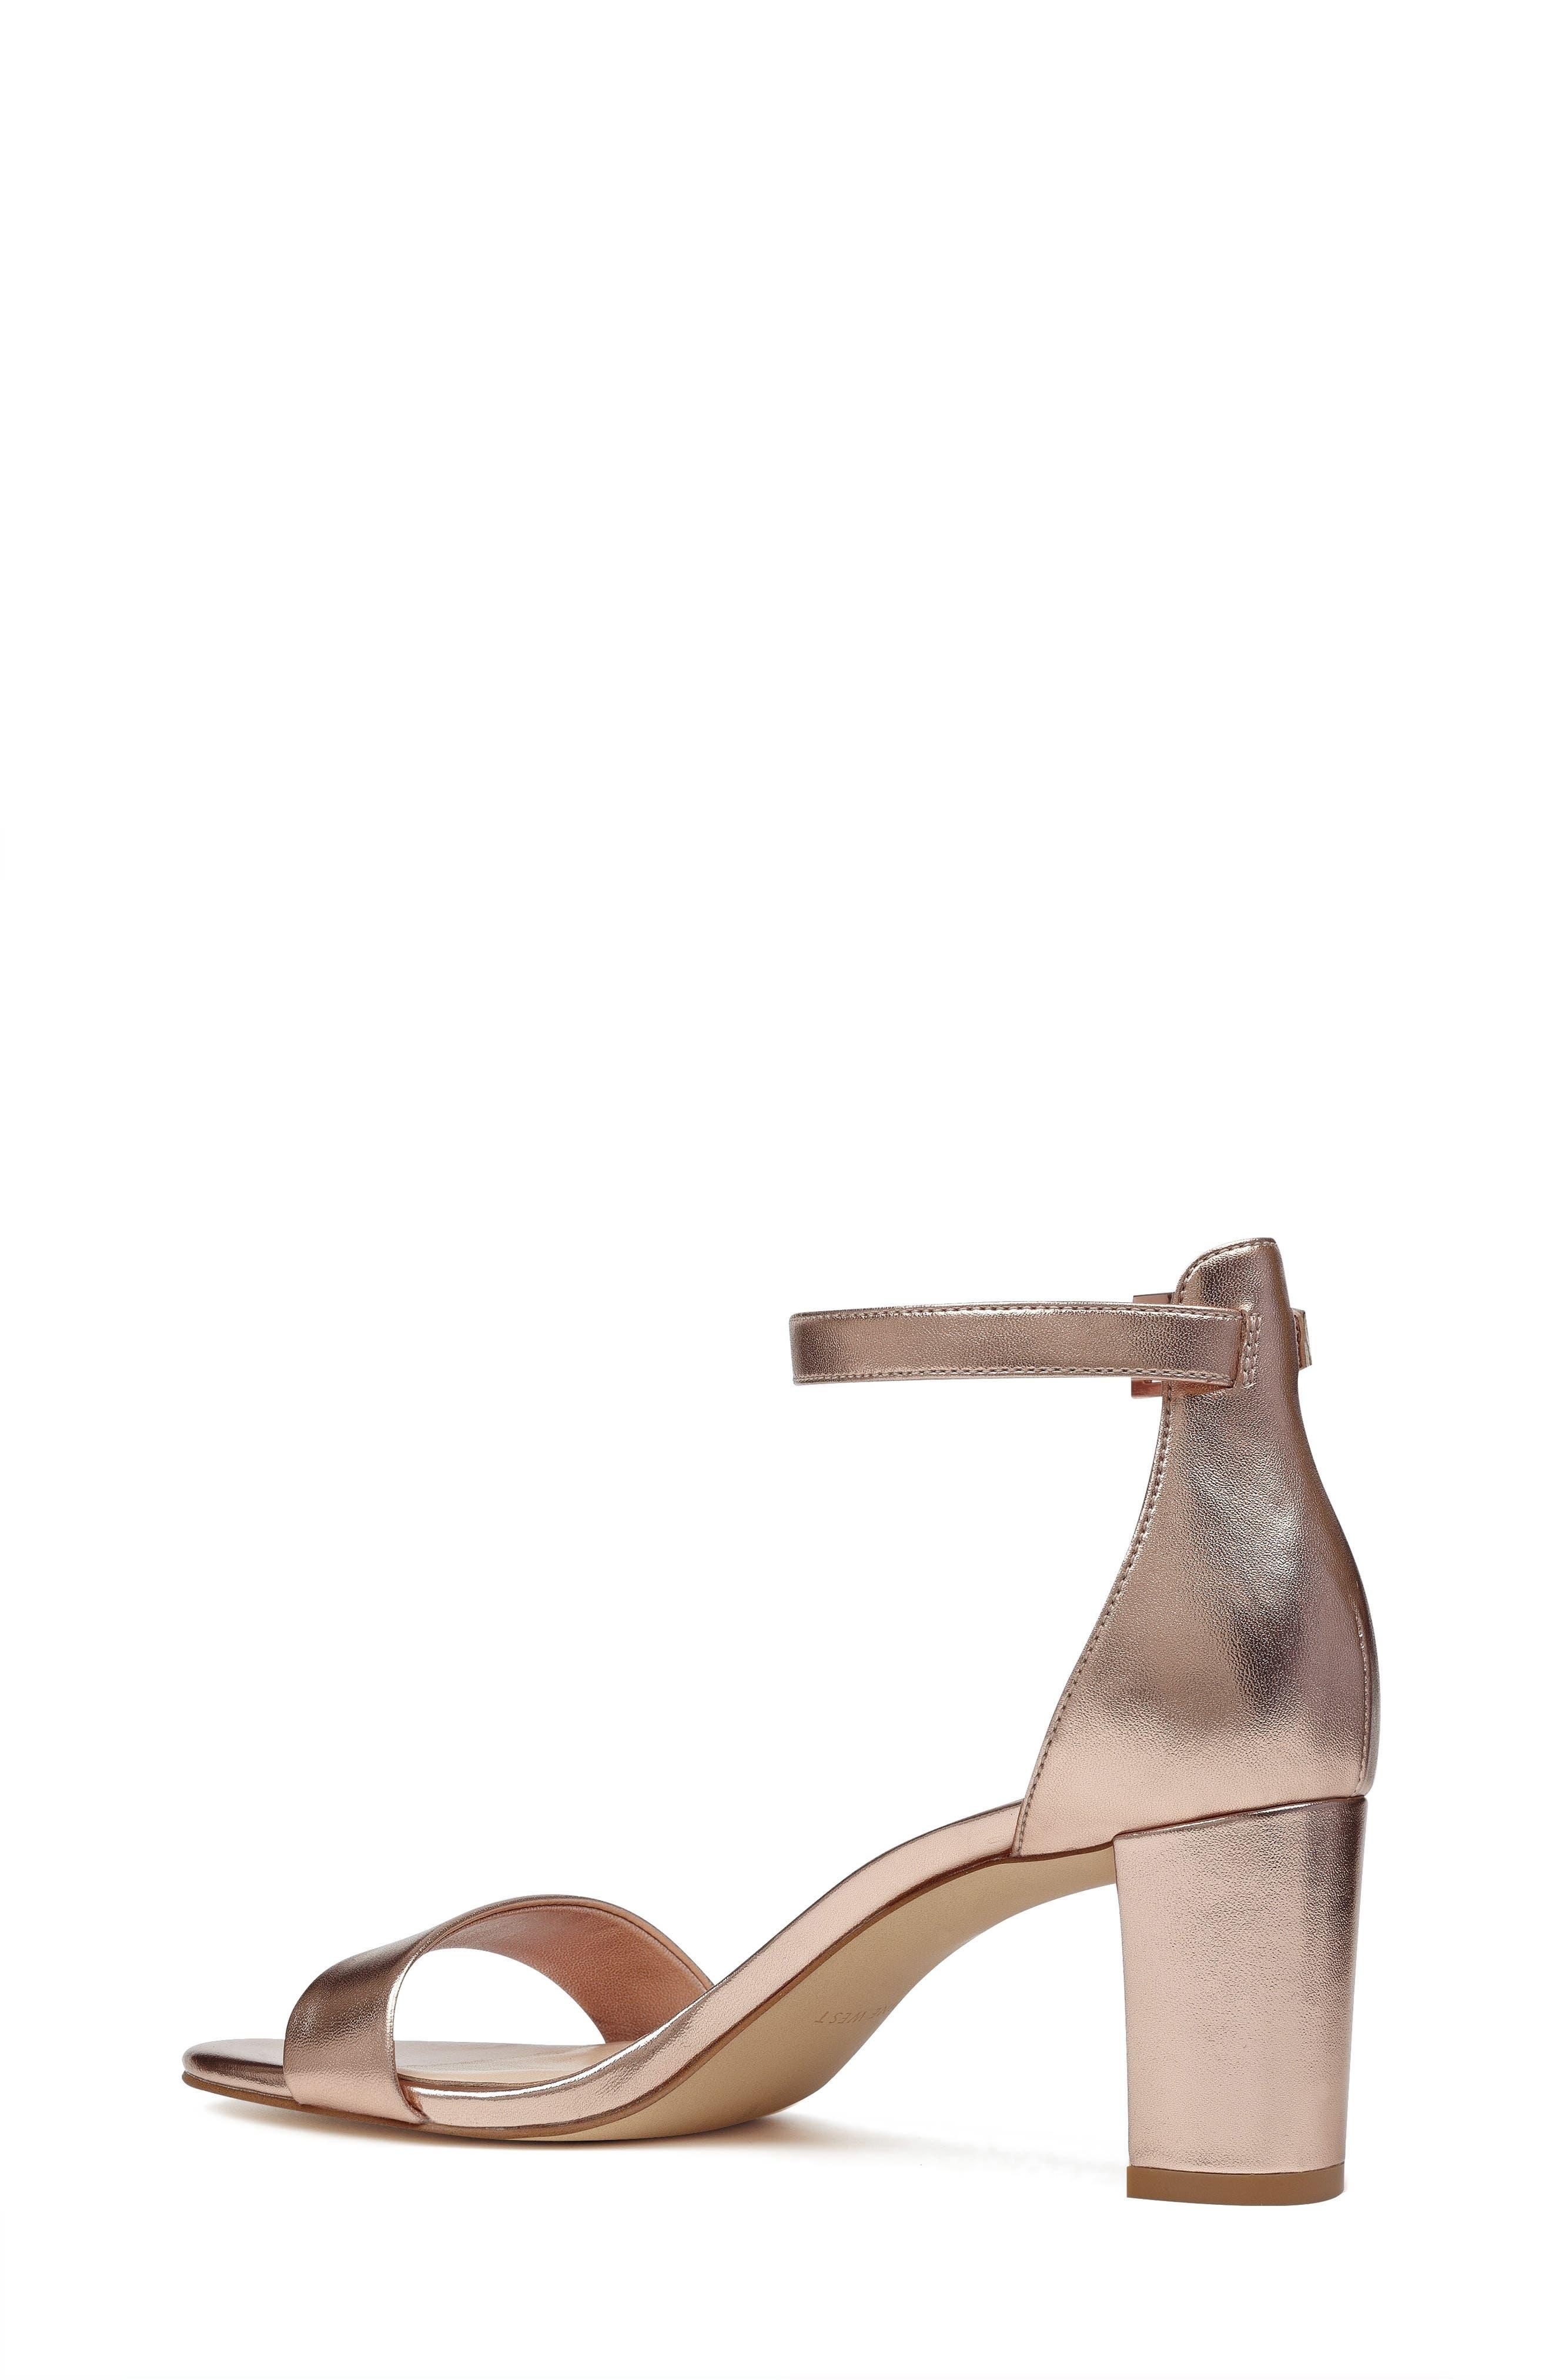 Pruce Ankle Strap Sandal,                             Alternate thumbnail 2, color,                             Matte Rose Gold